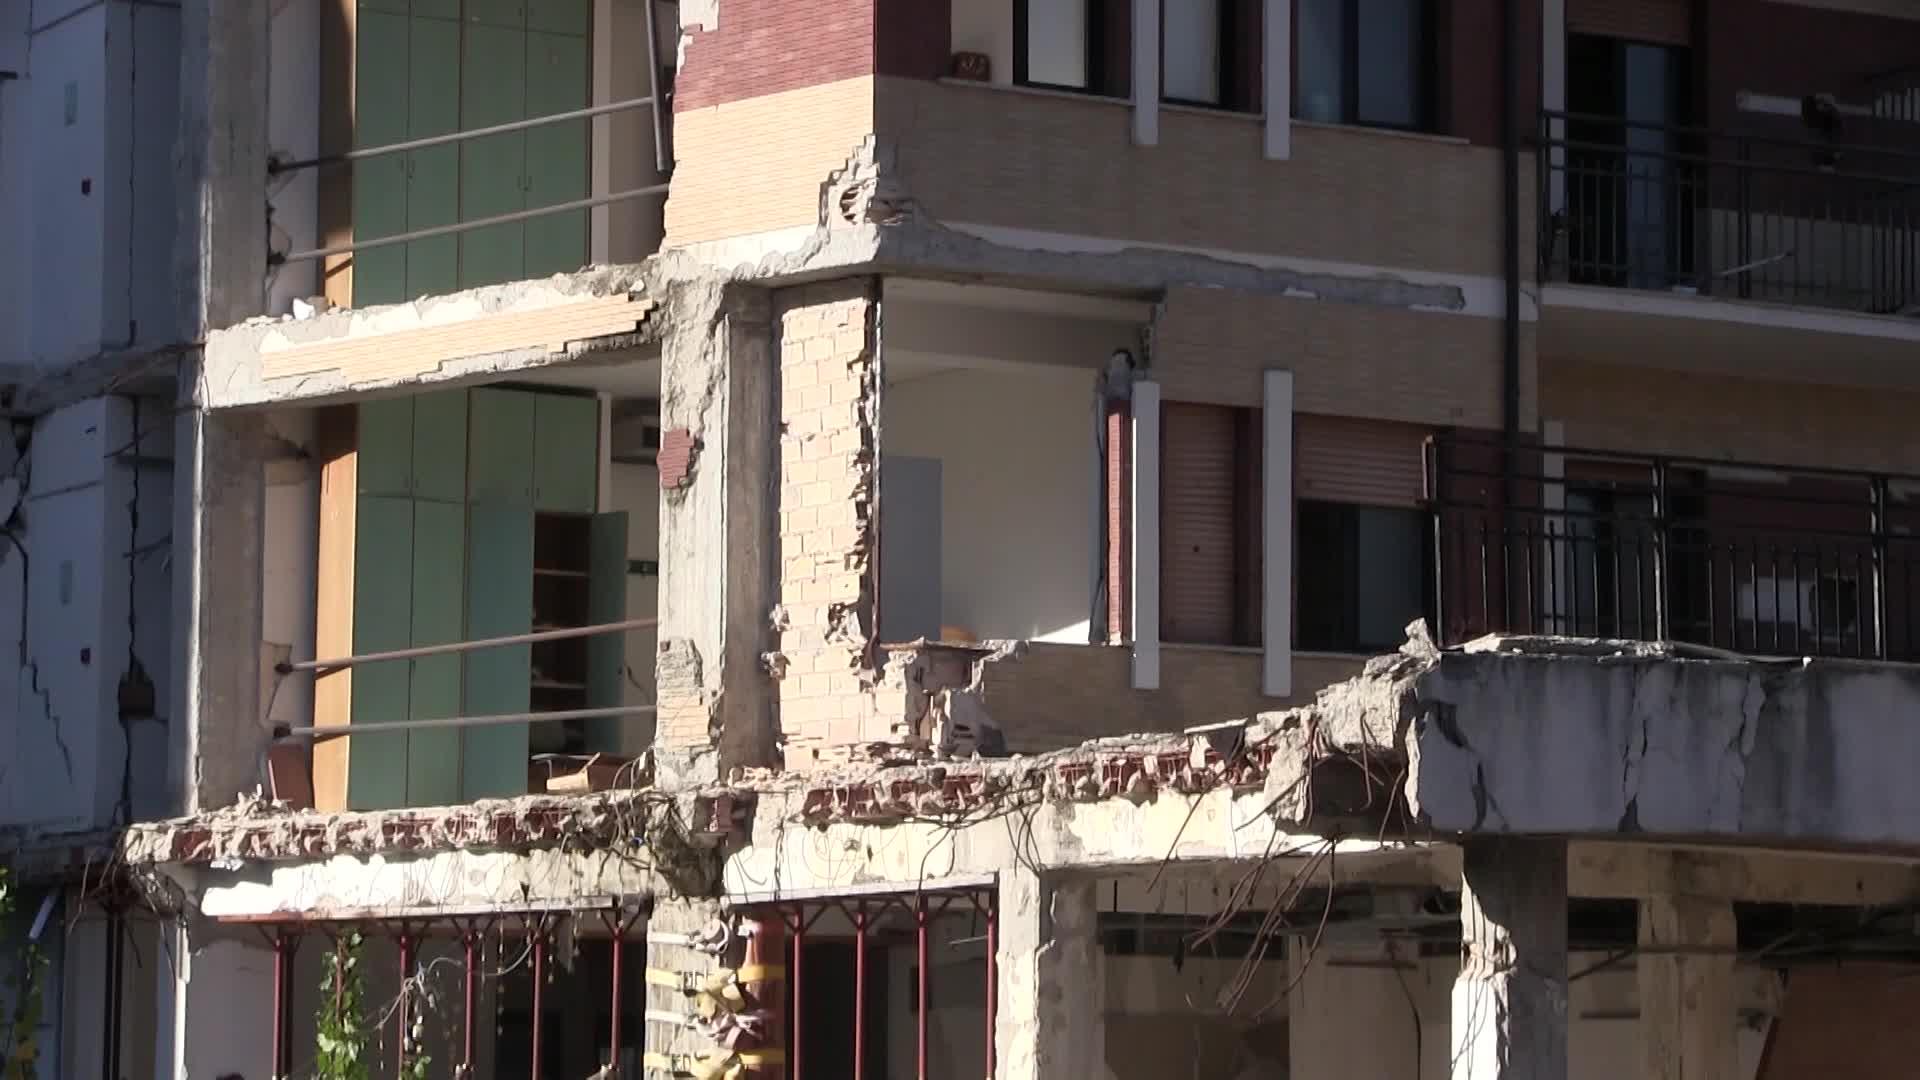 L'Aquila Earthquake - Aftermath